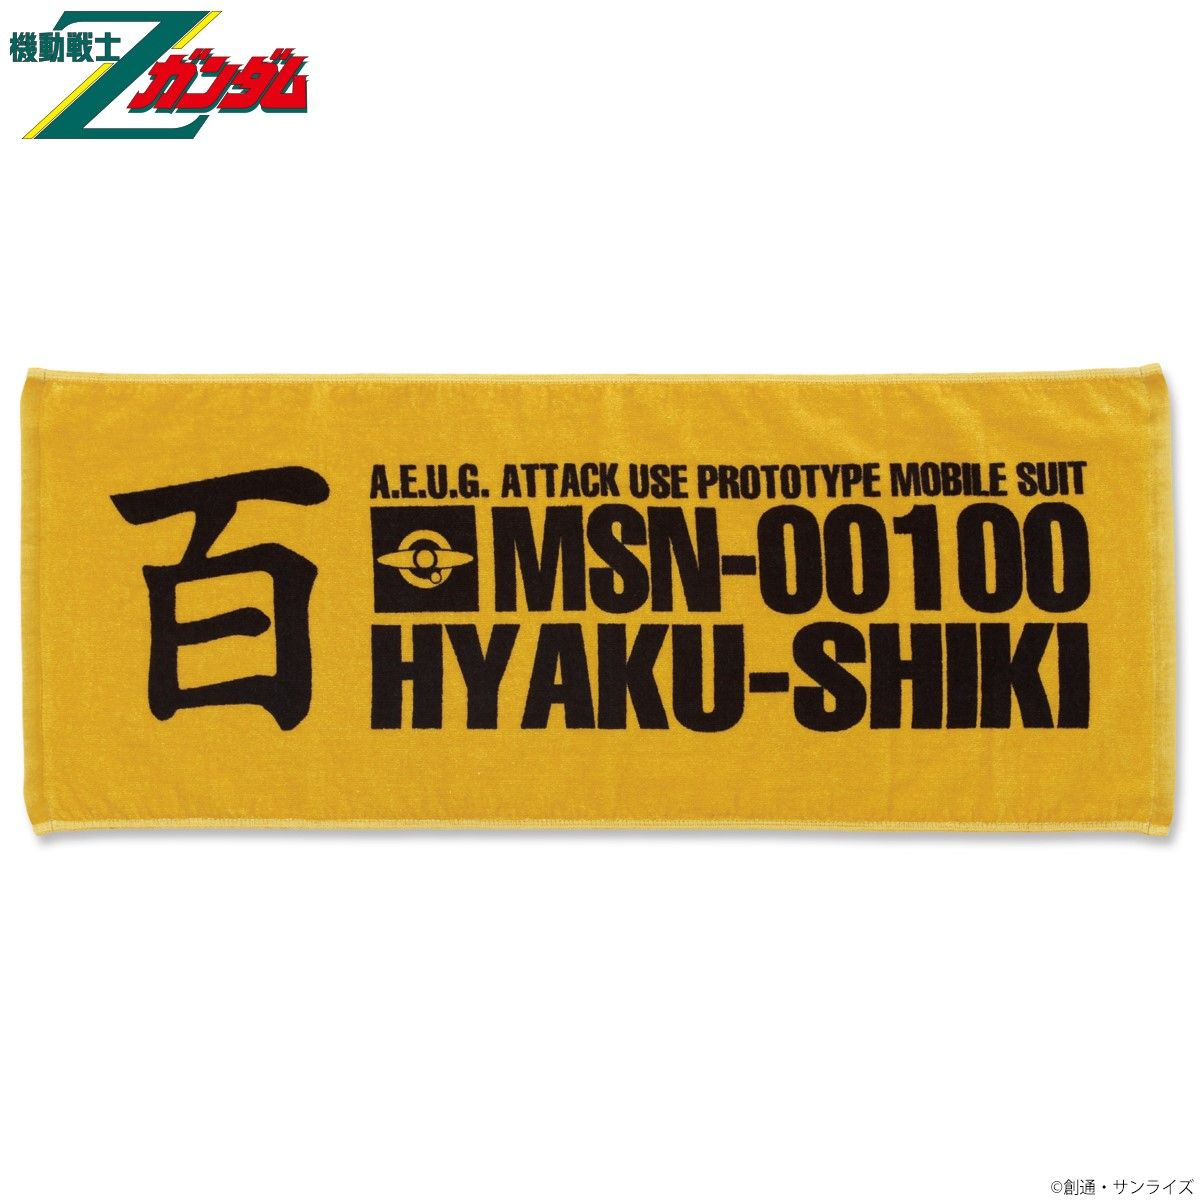 Mobile Suit Zeta Gundam MSN-00100 Face Towel